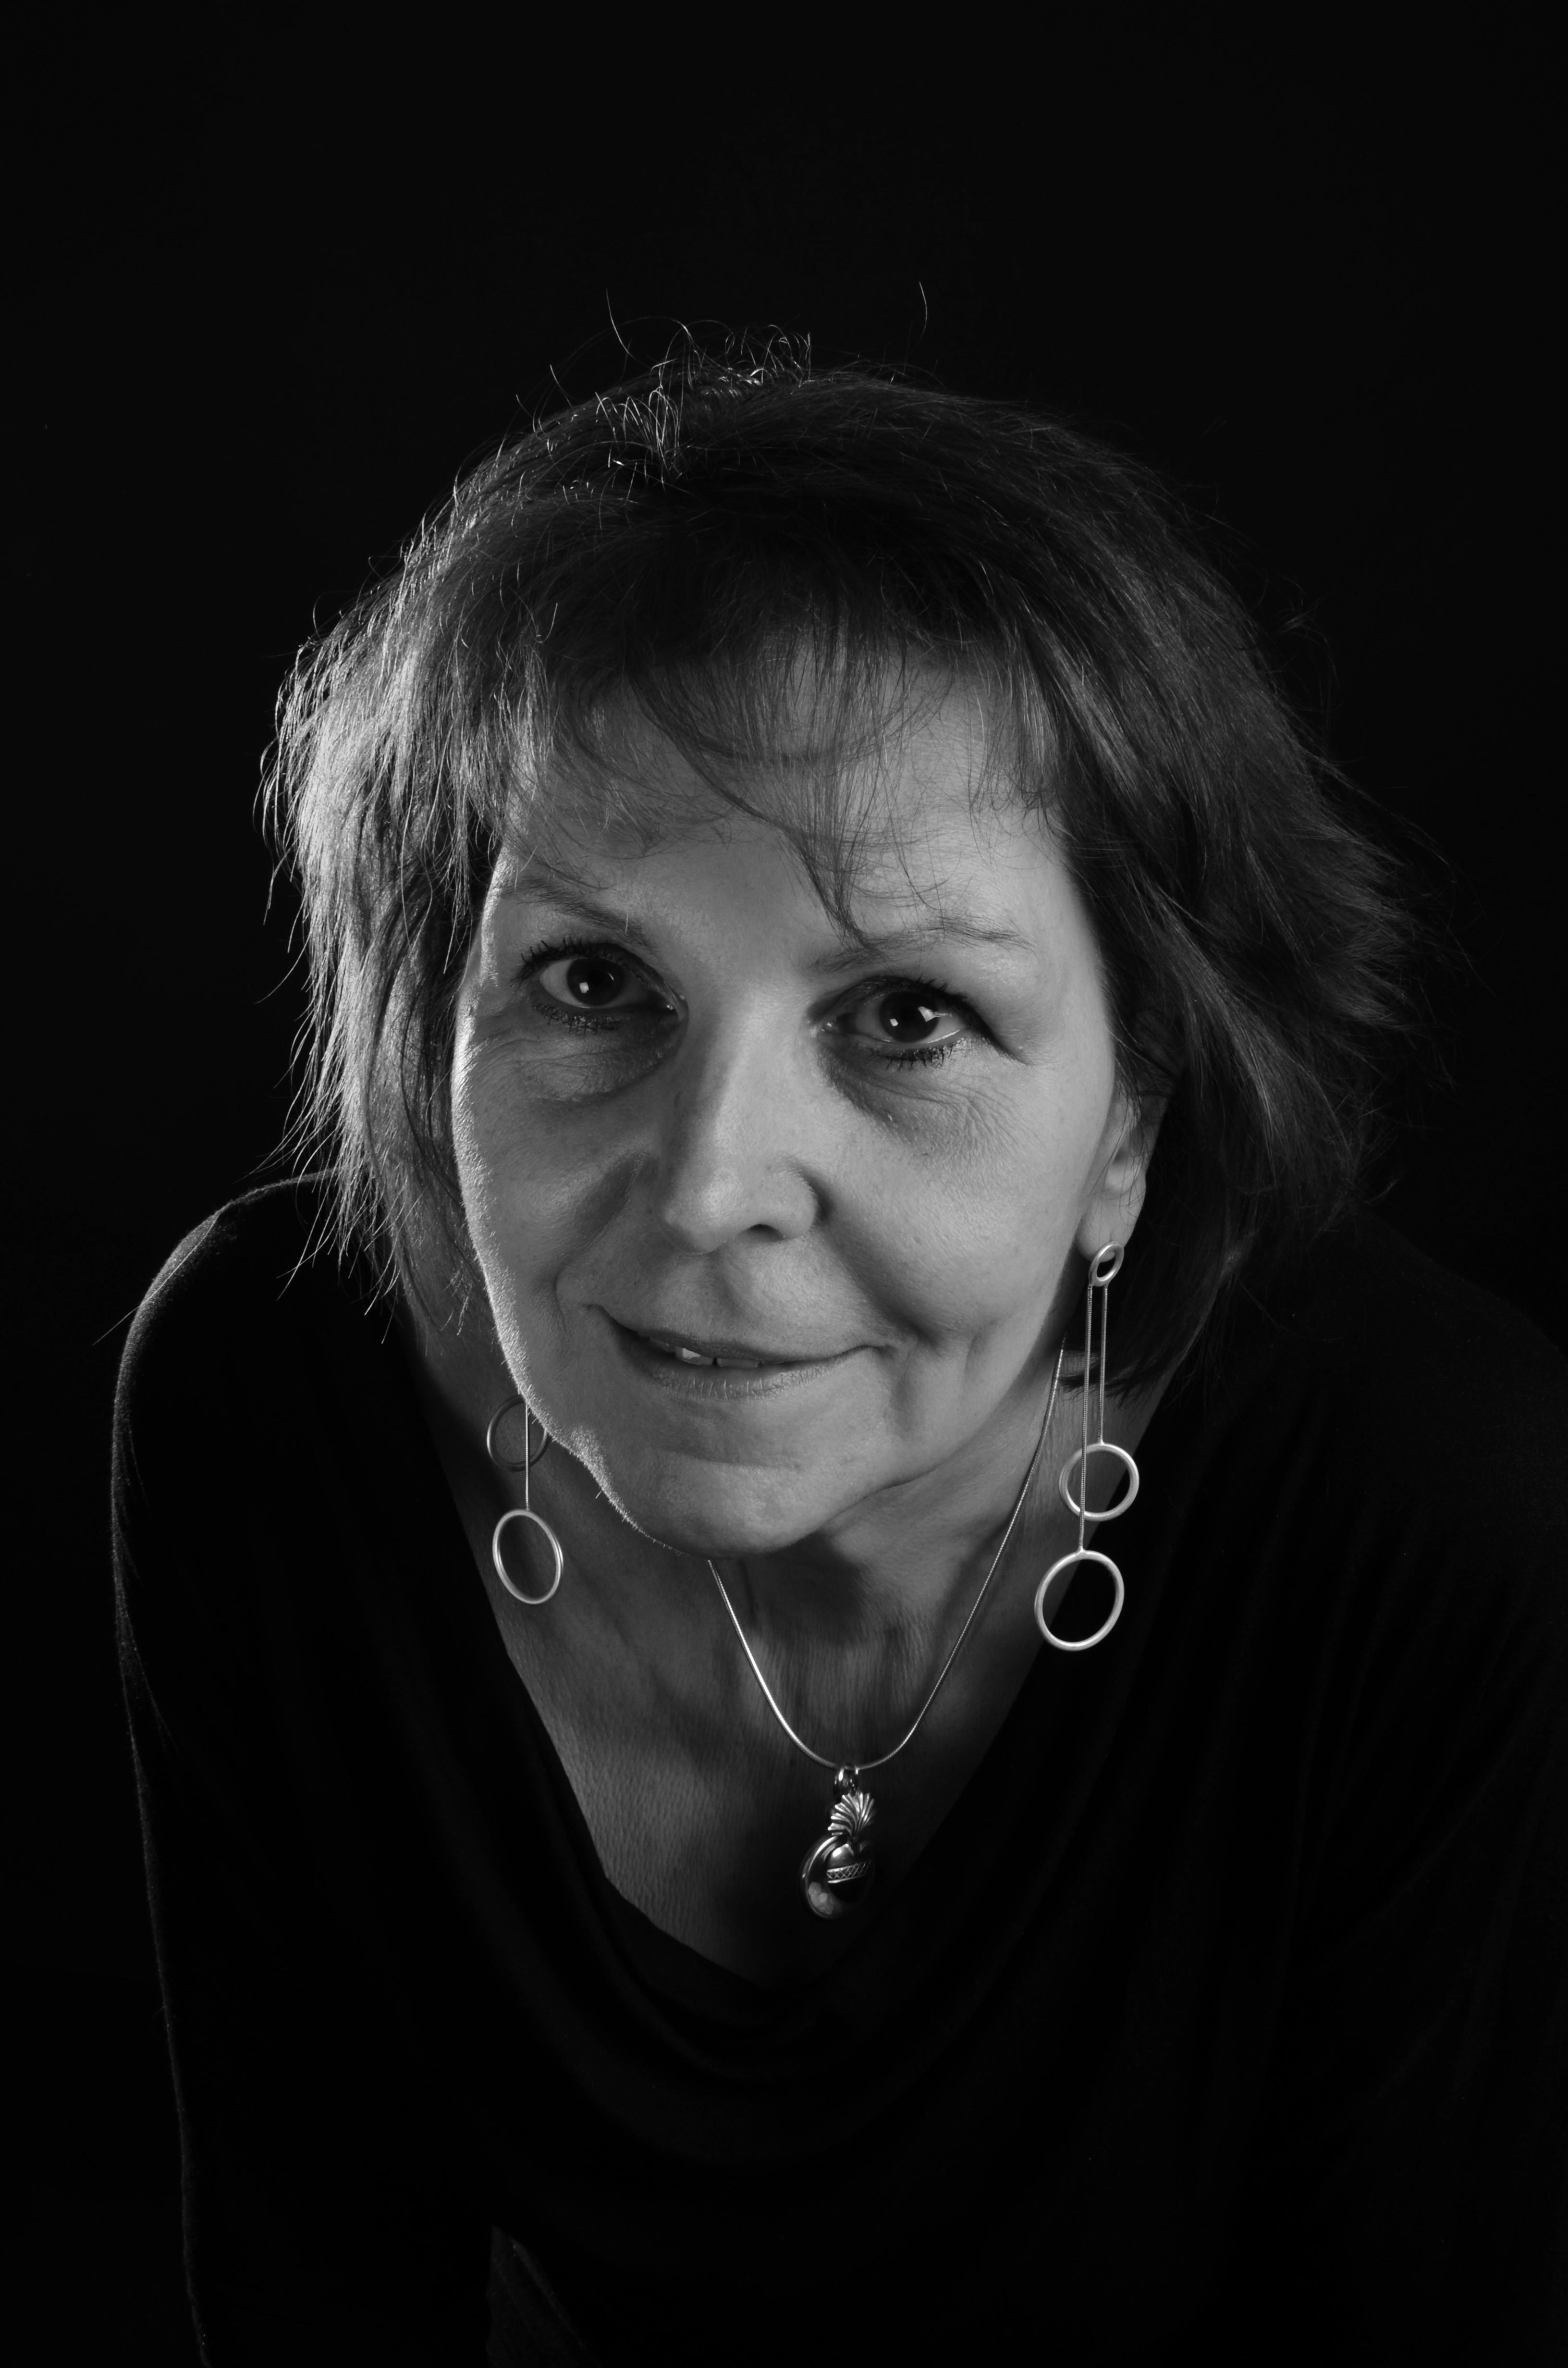 DELORY-MOMBERGER Christine, artiste